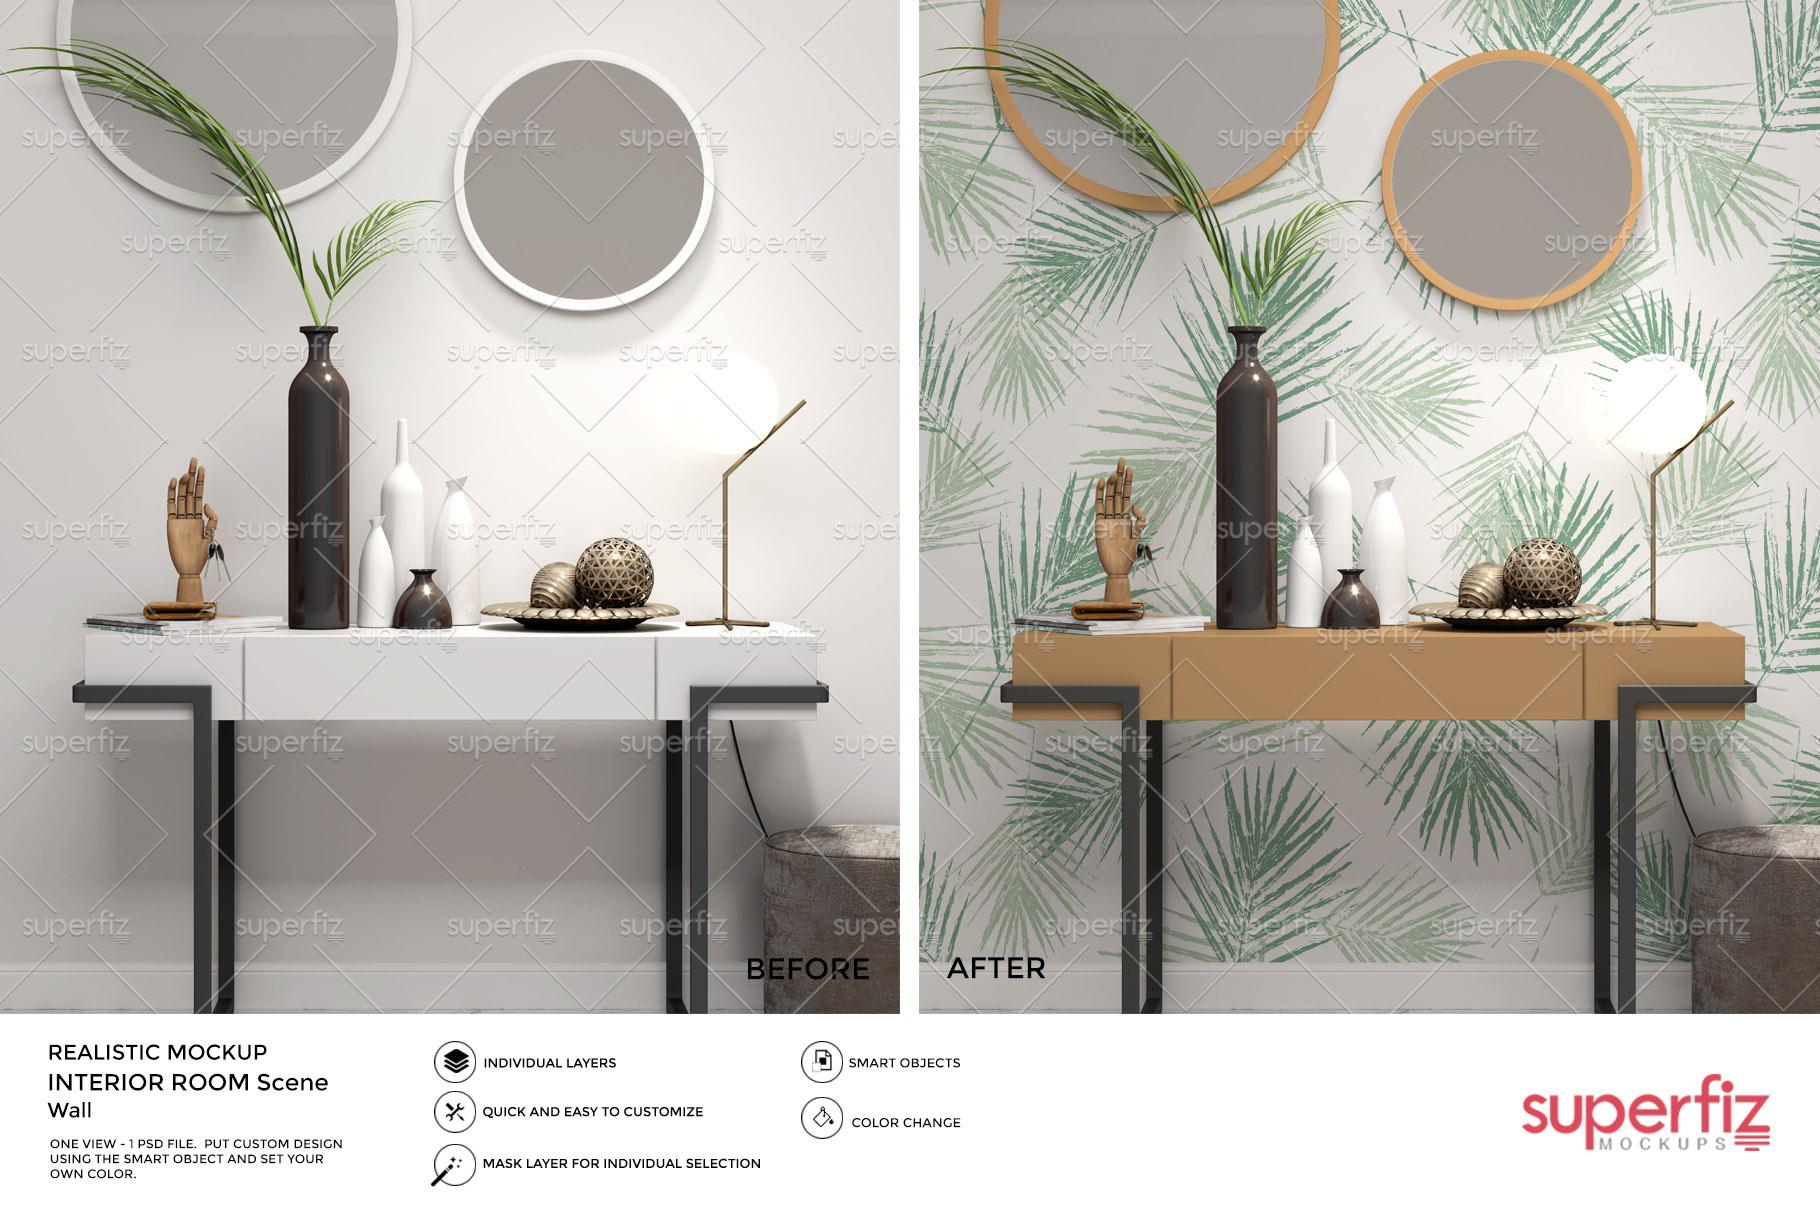 Wallpaper Mockup Bundle Vol.2 - SM98PACK - 5PSD SCENE example image 5